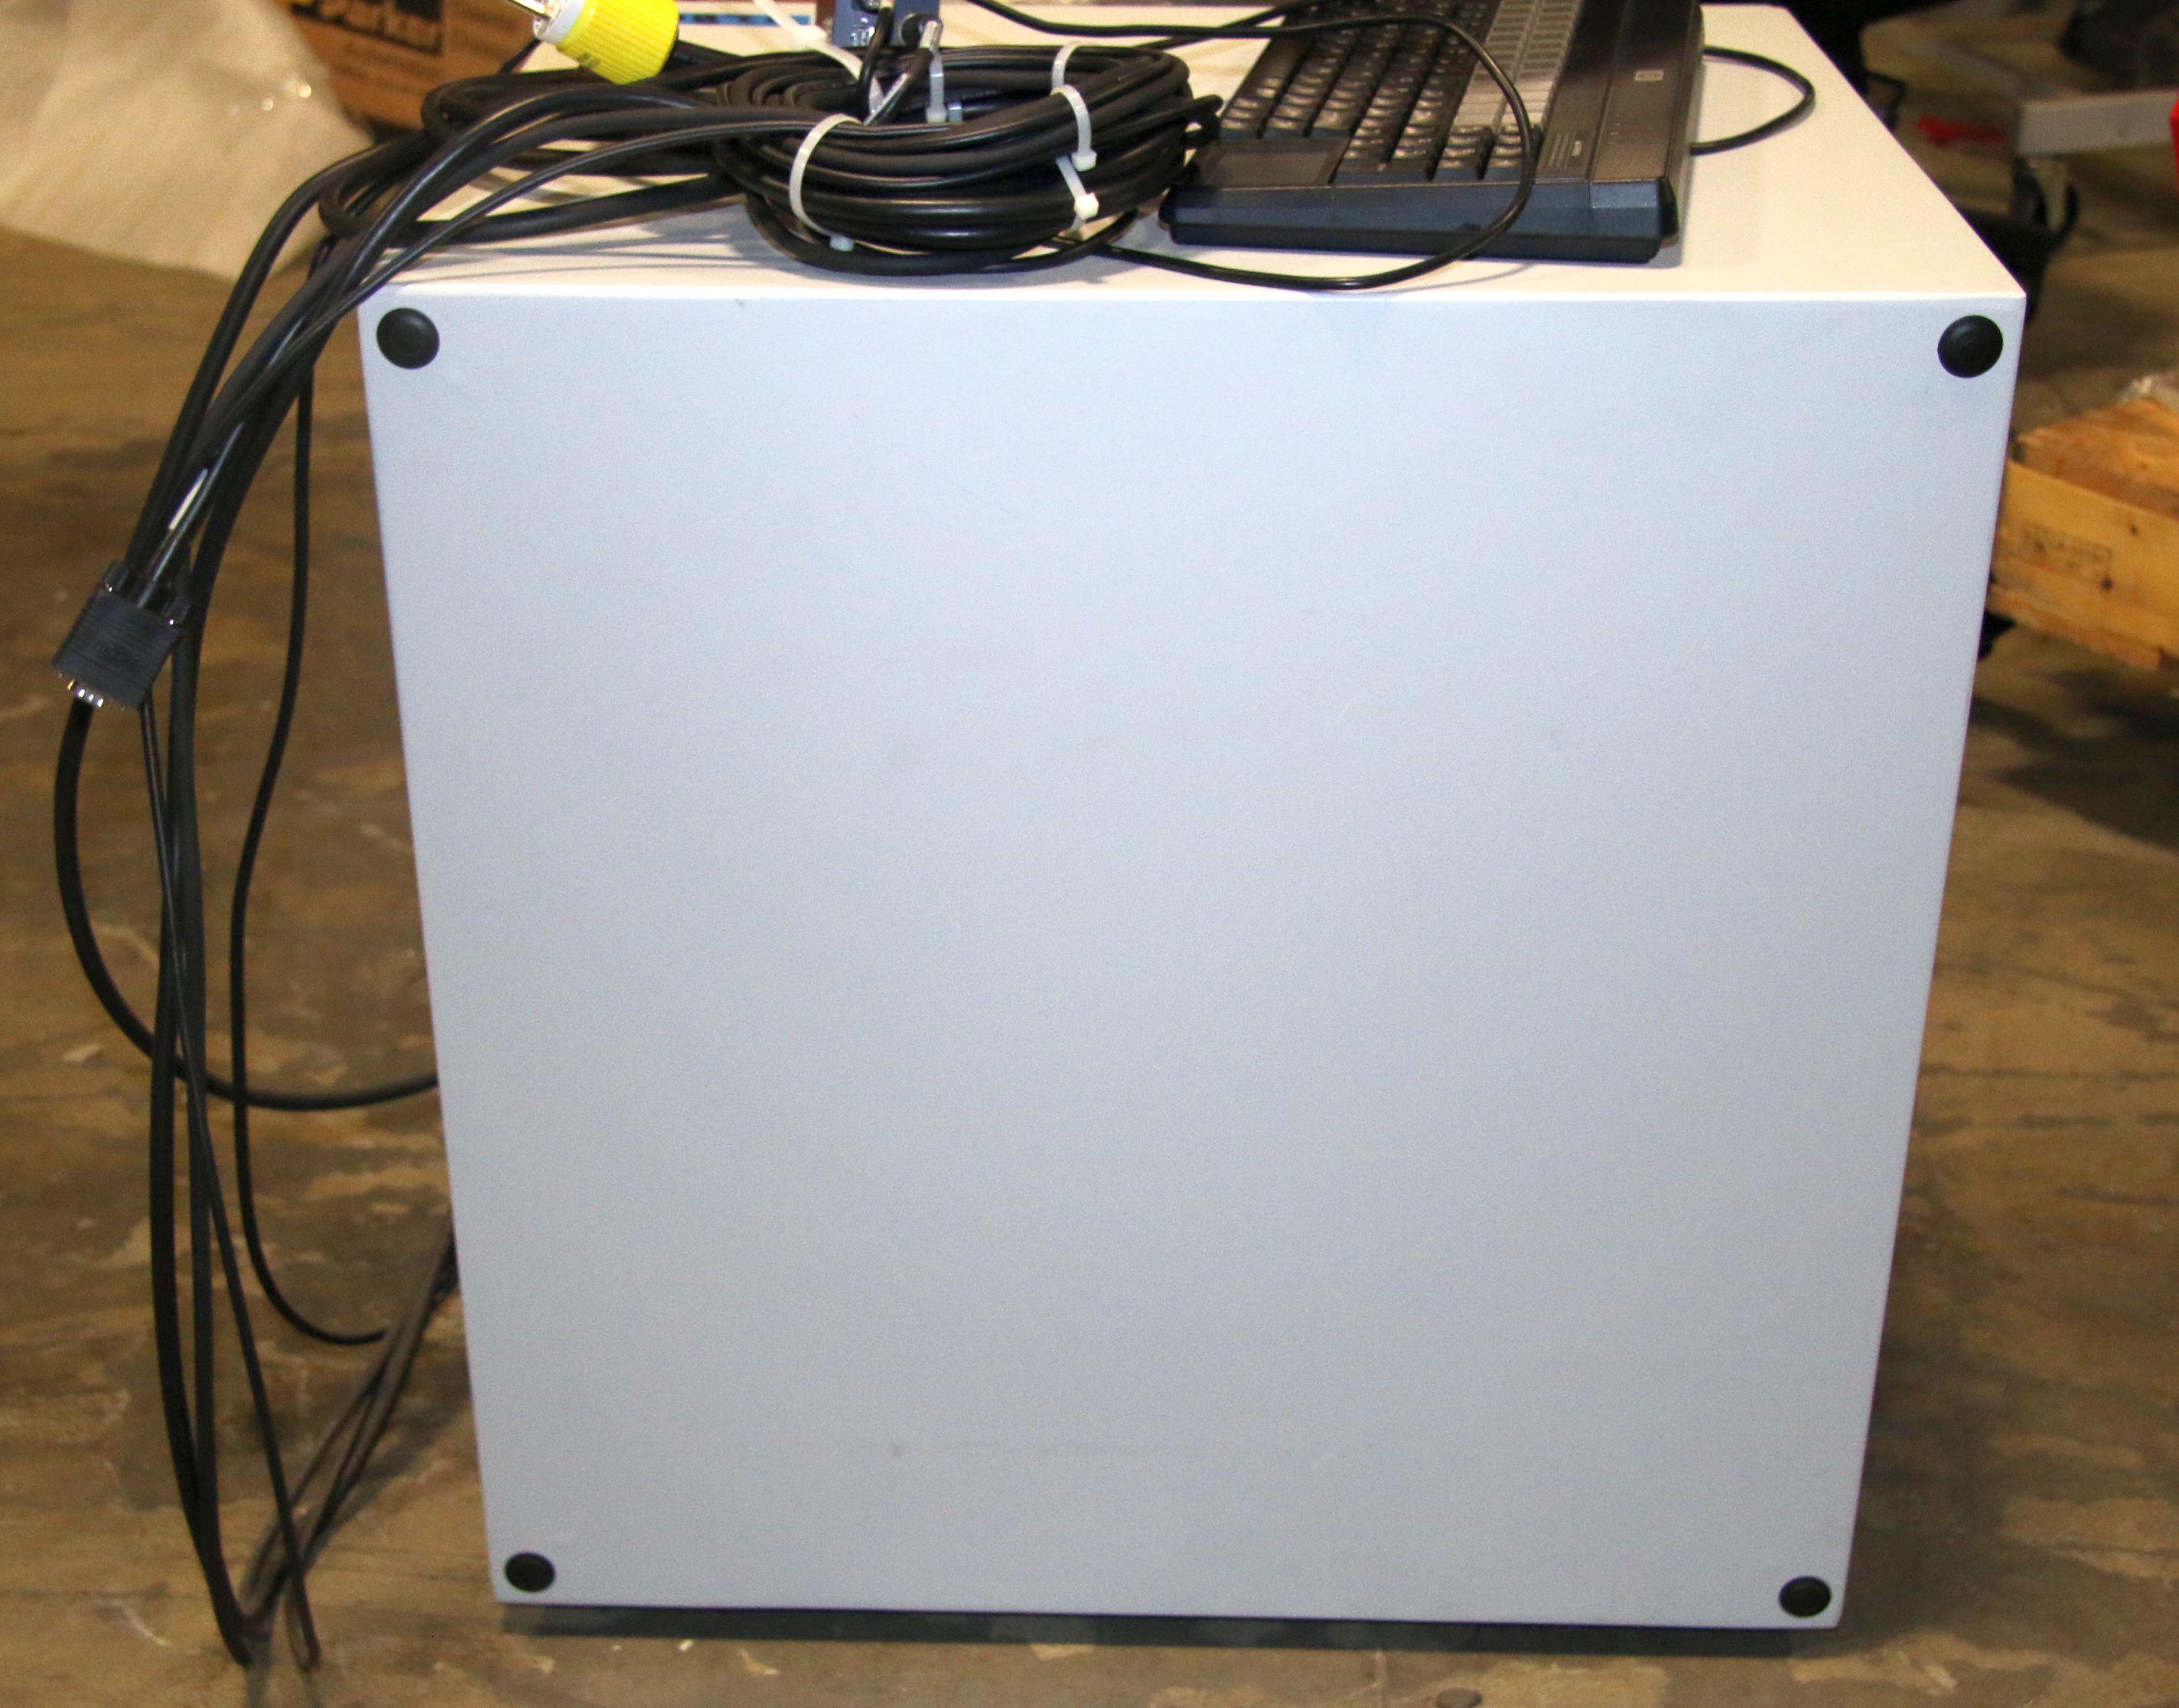 (1) Used Allen Bradley 750r Non-Display Computer with Allen Bradley 1700P Displa